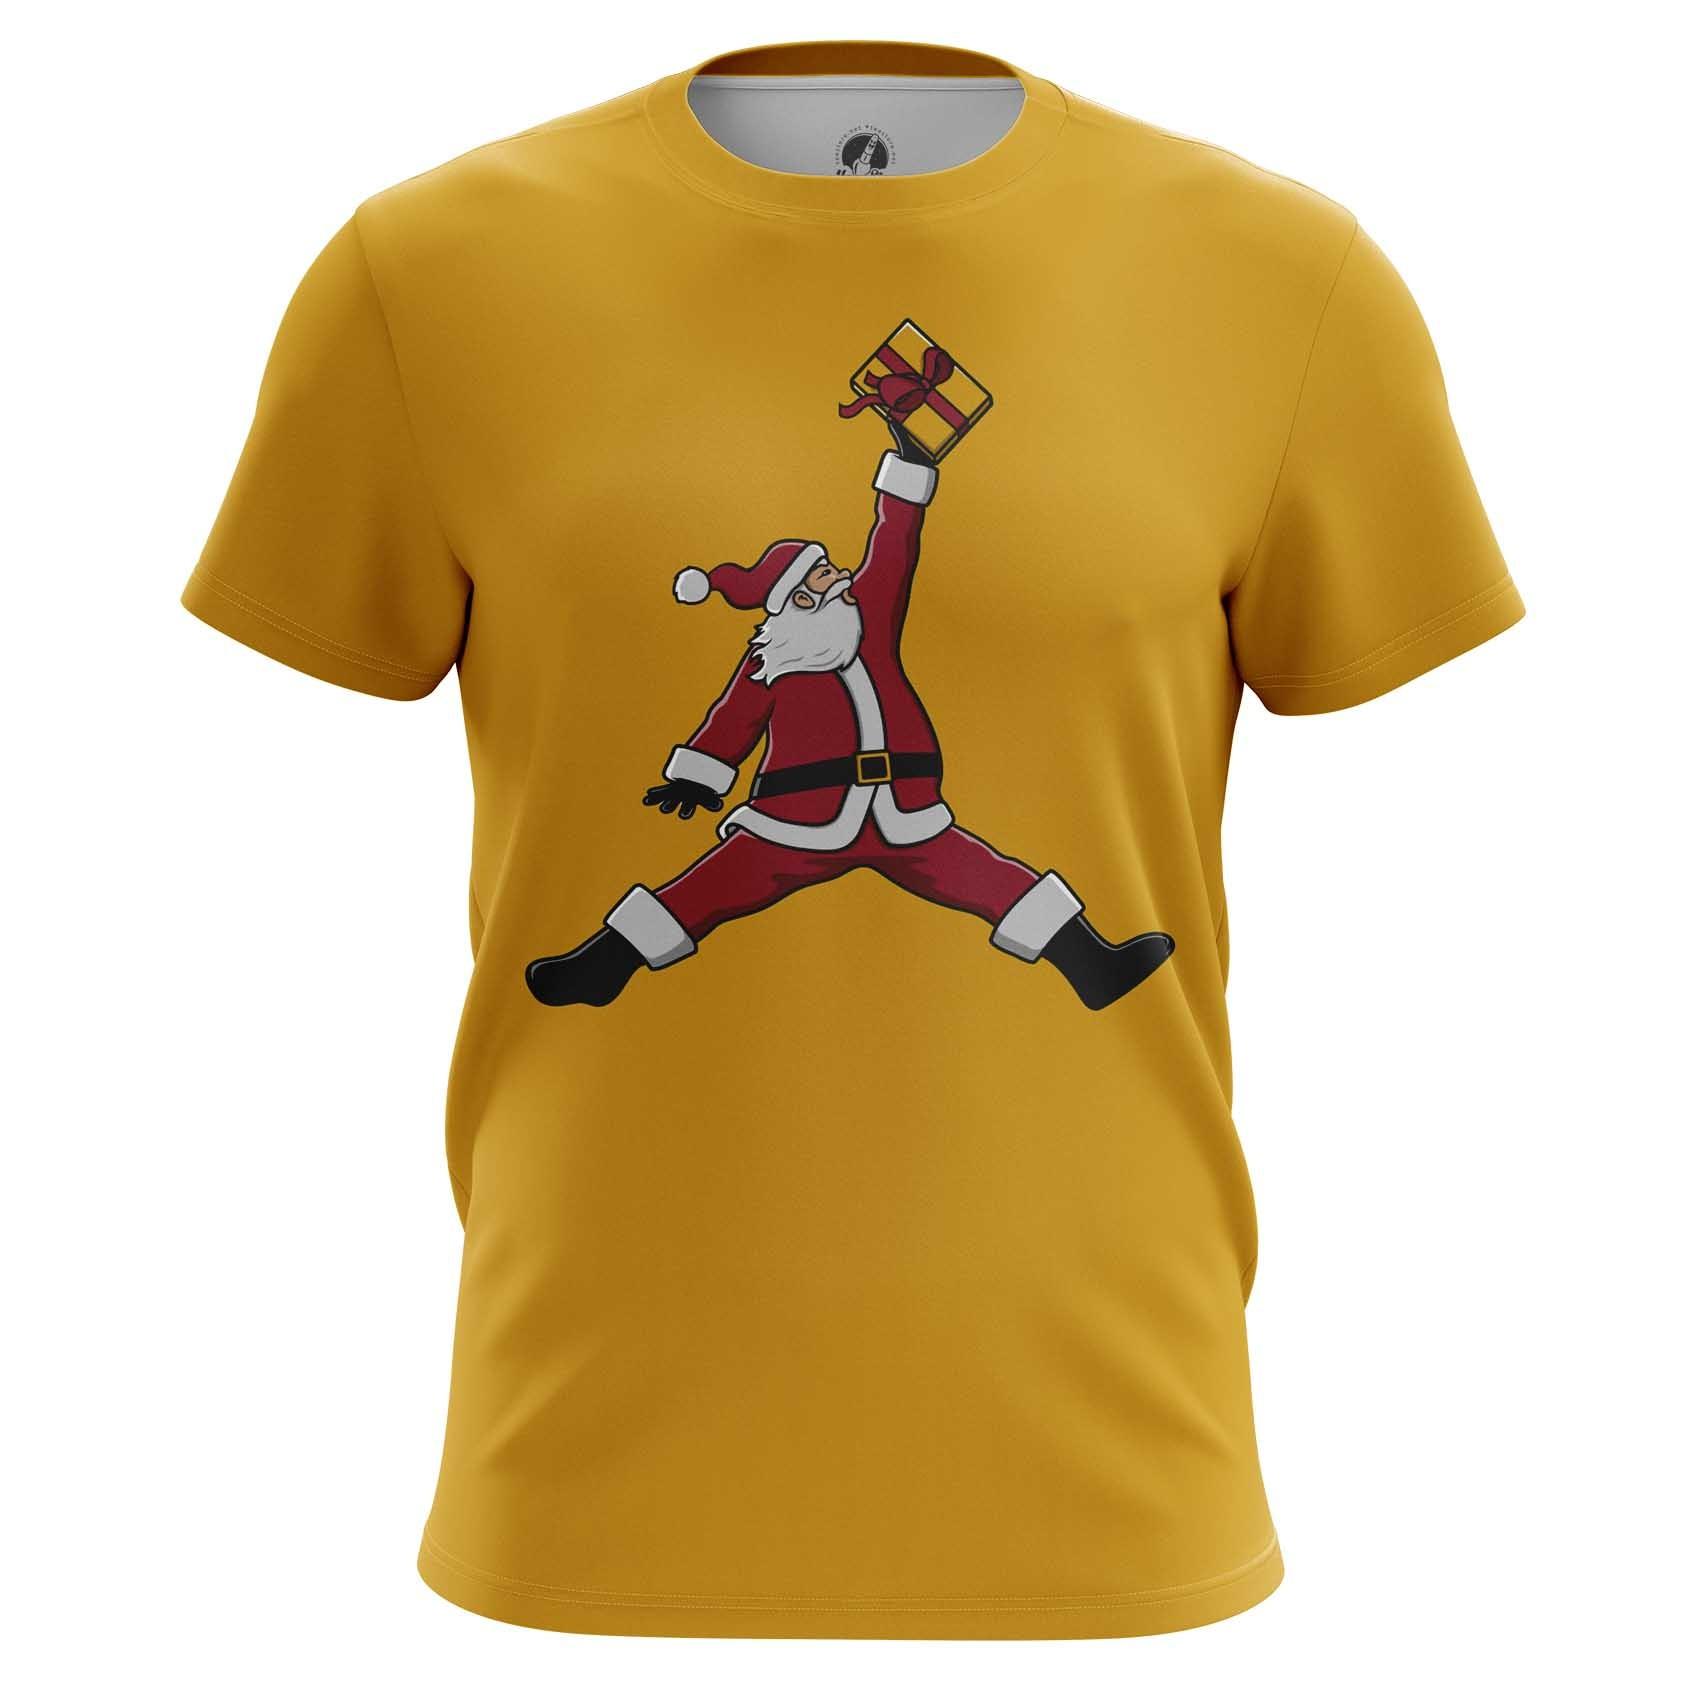 Merchandise T-Shirt Nba Jordan Santa Claus Christmas